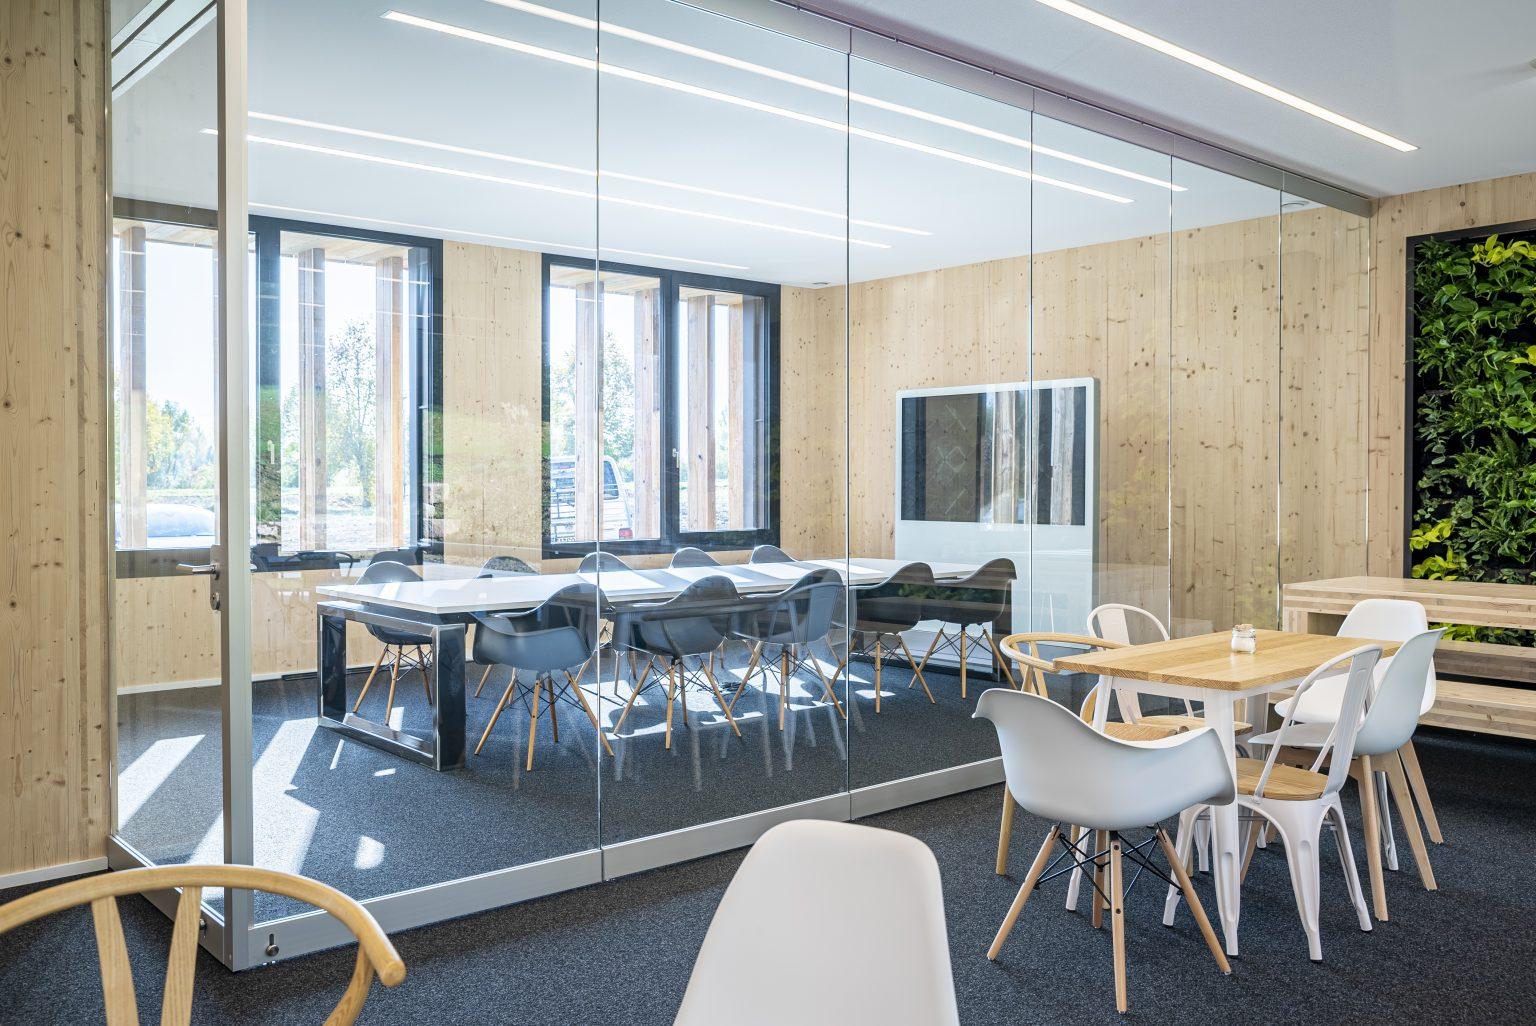 Bürogebäude_Zick-Hessler_Holzbauweise (24)